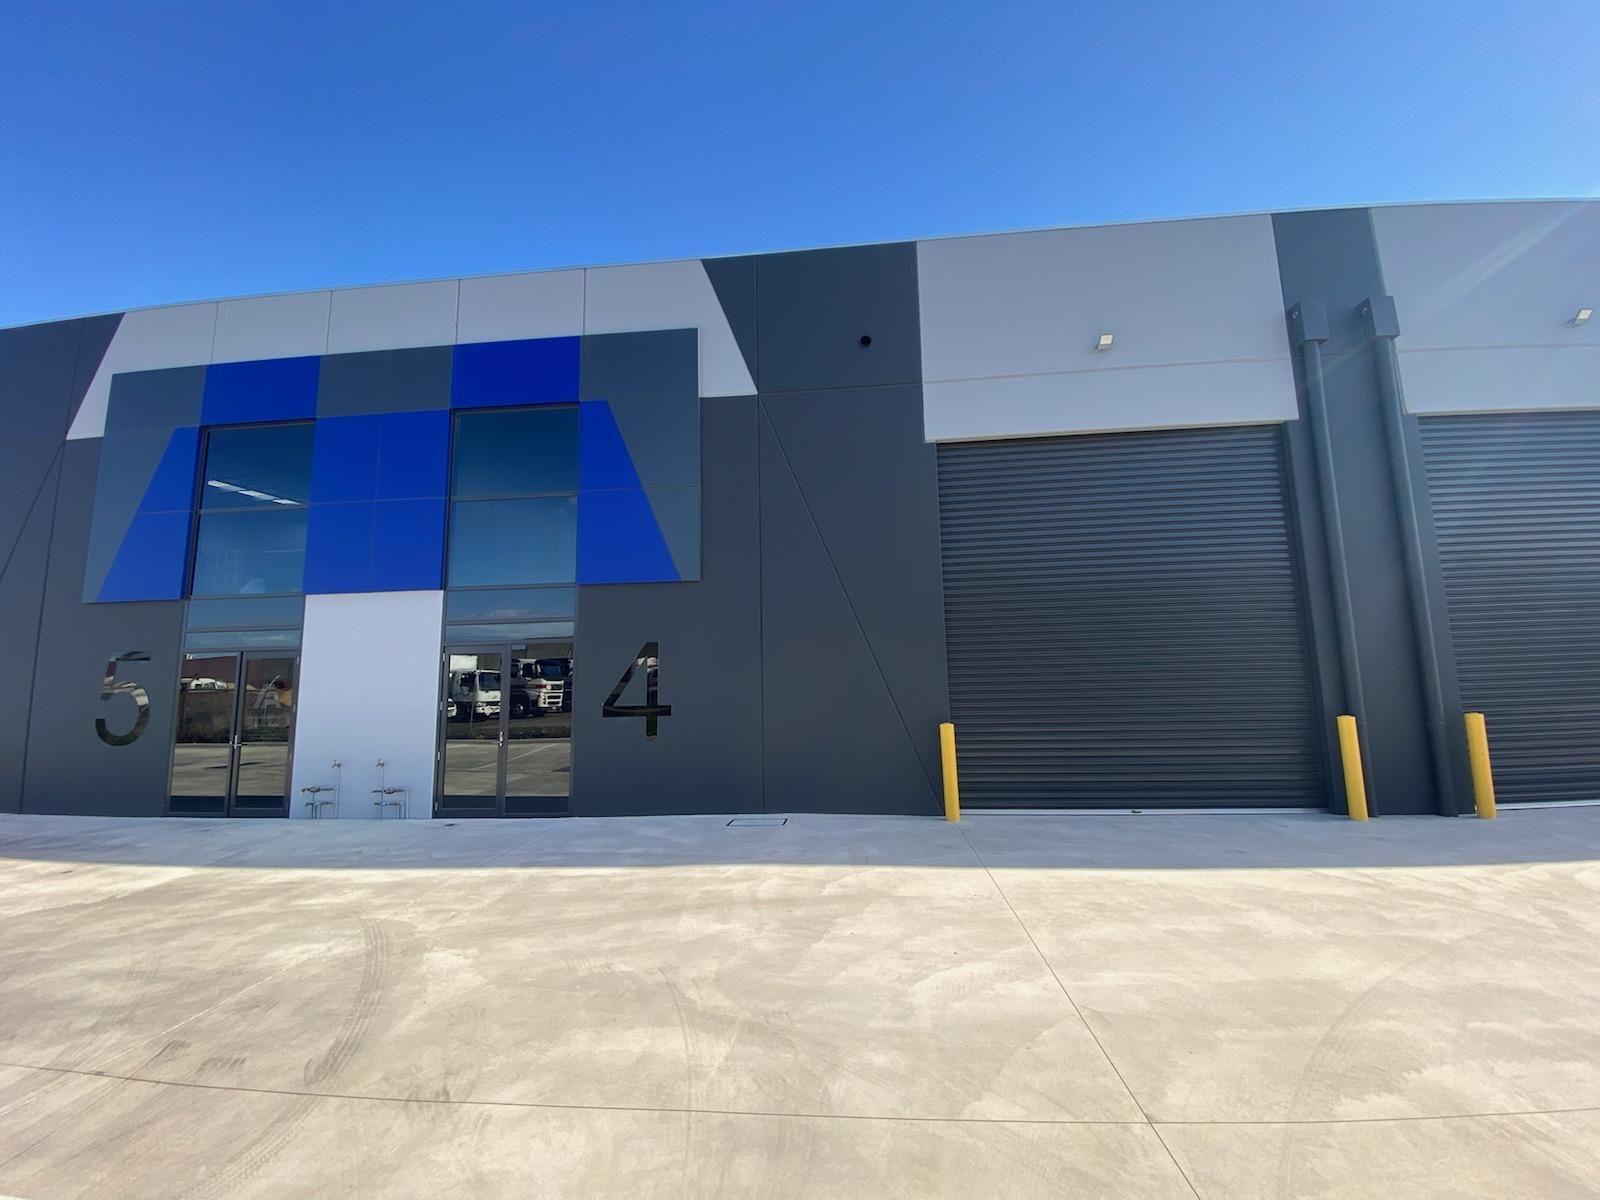 4/8 Industrial Avenue, Hoppers Crossing, VIC 3029